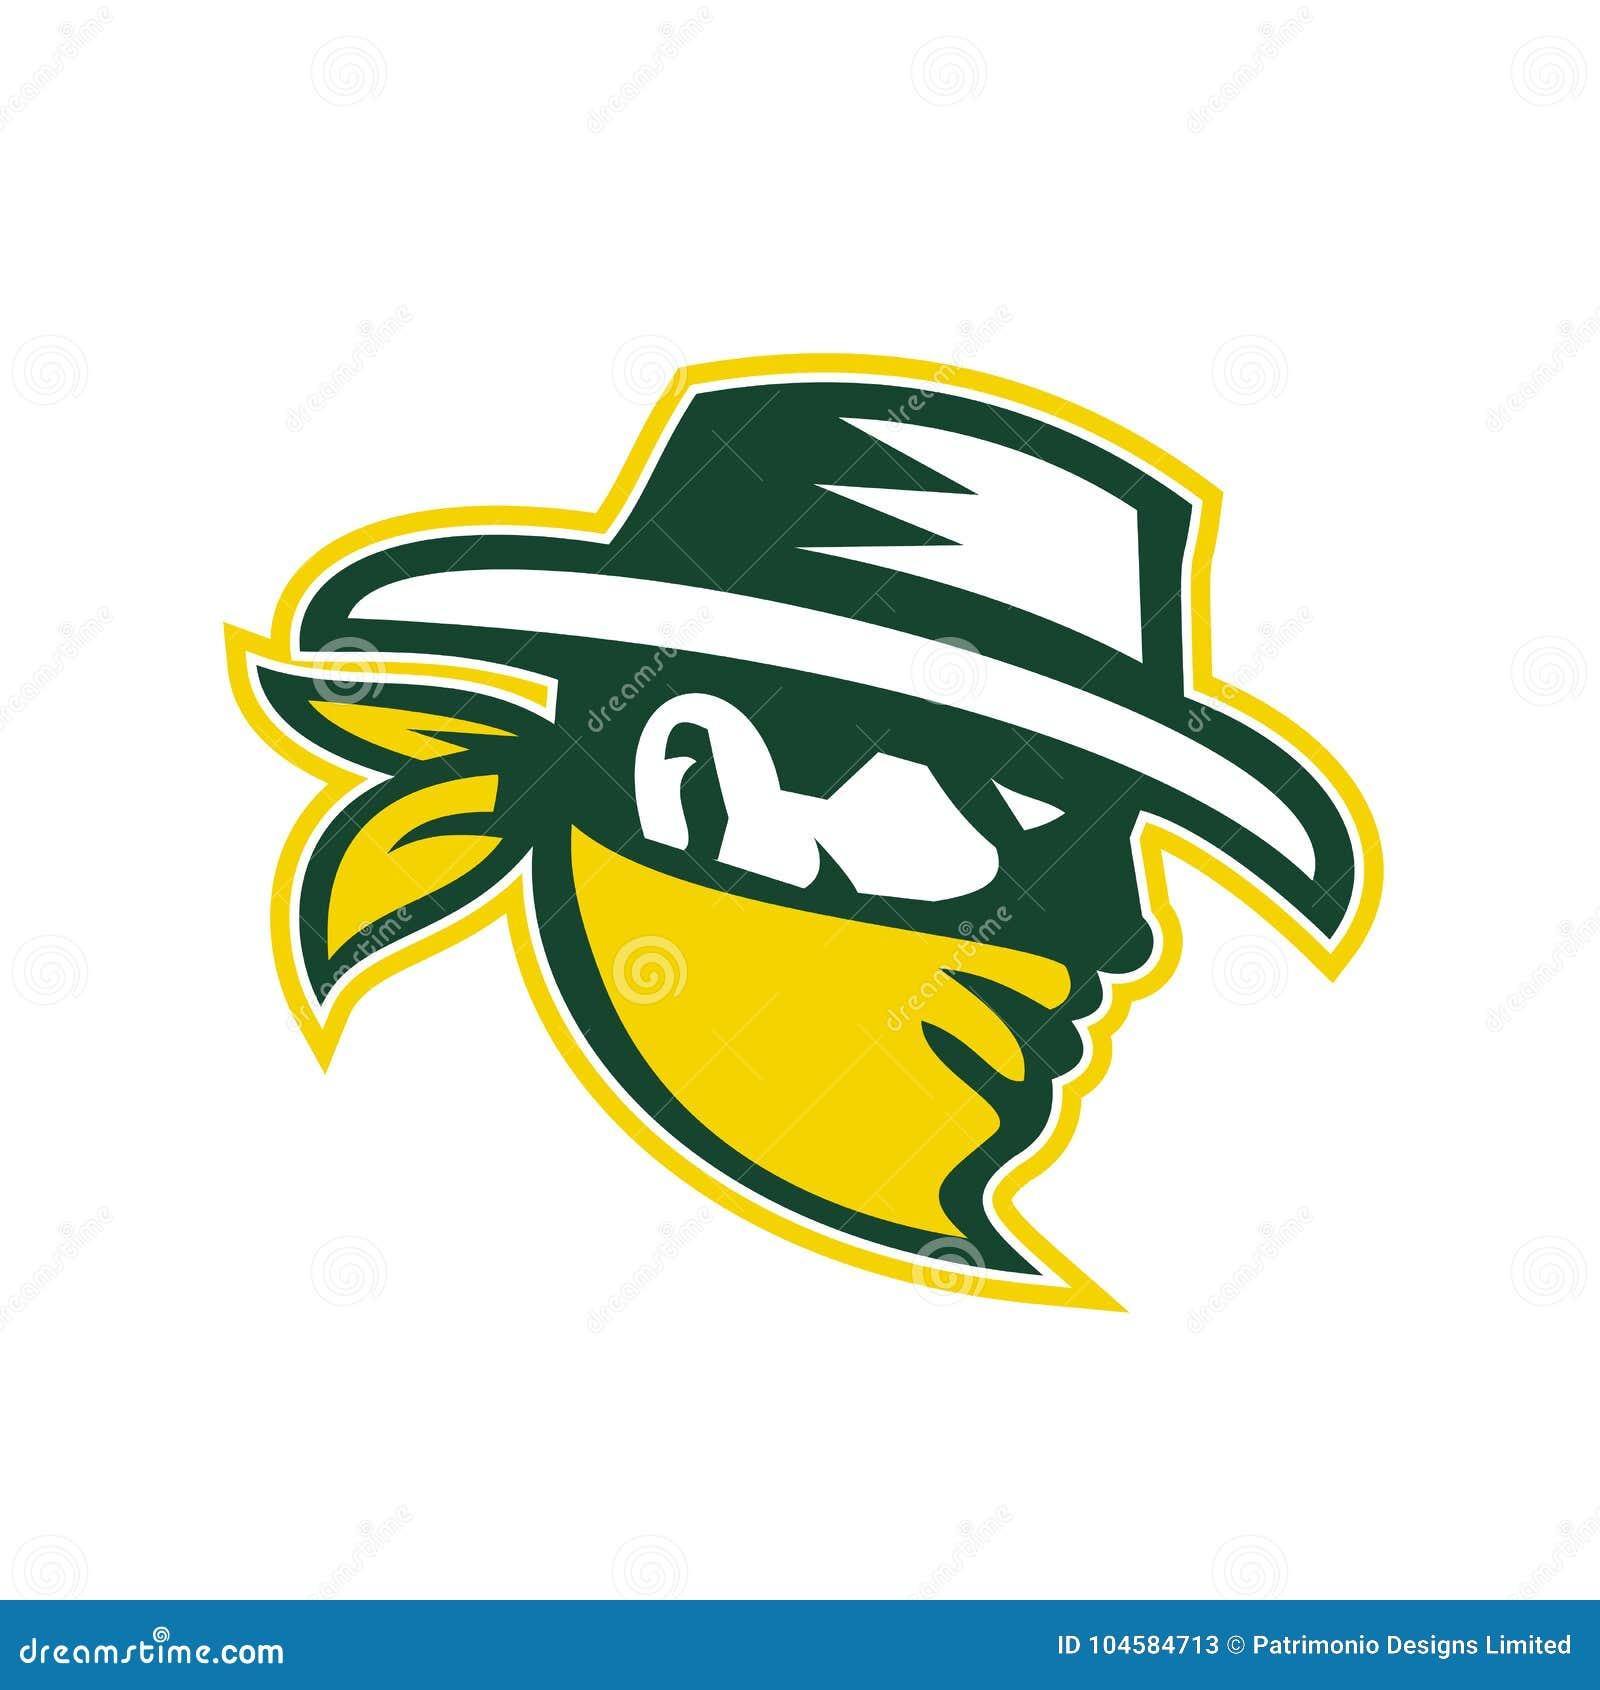 3a816621ec6 Green Bandit Mascot stock vector. Illustration of icon - 104584713